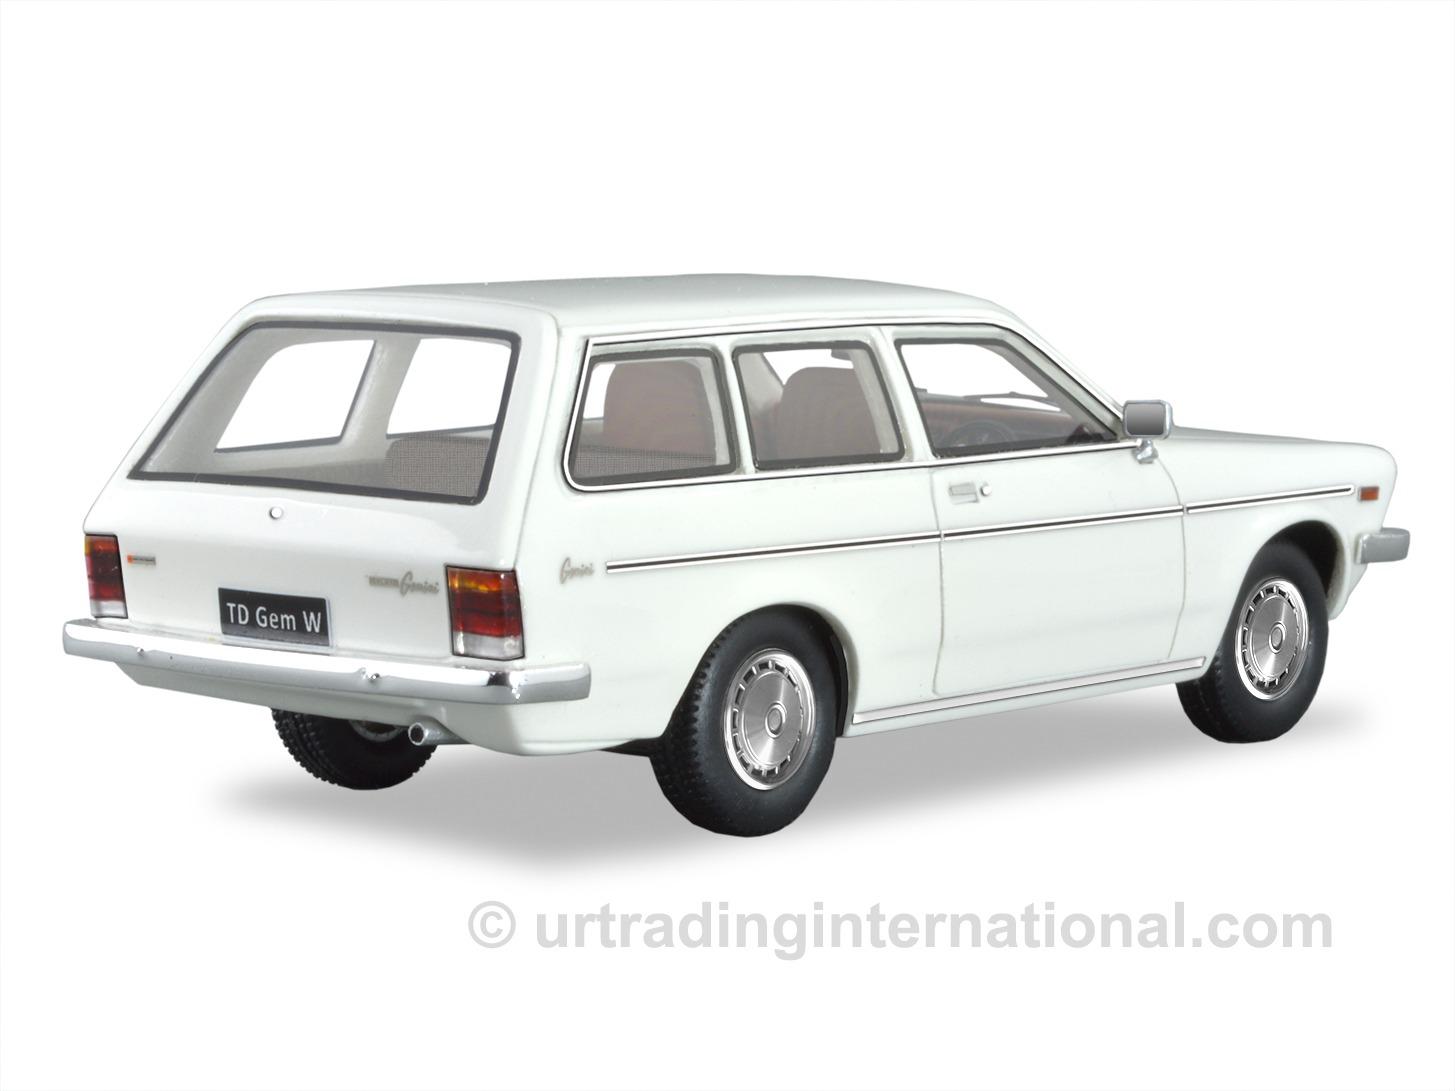 1979 TD Gemini Wagon – White